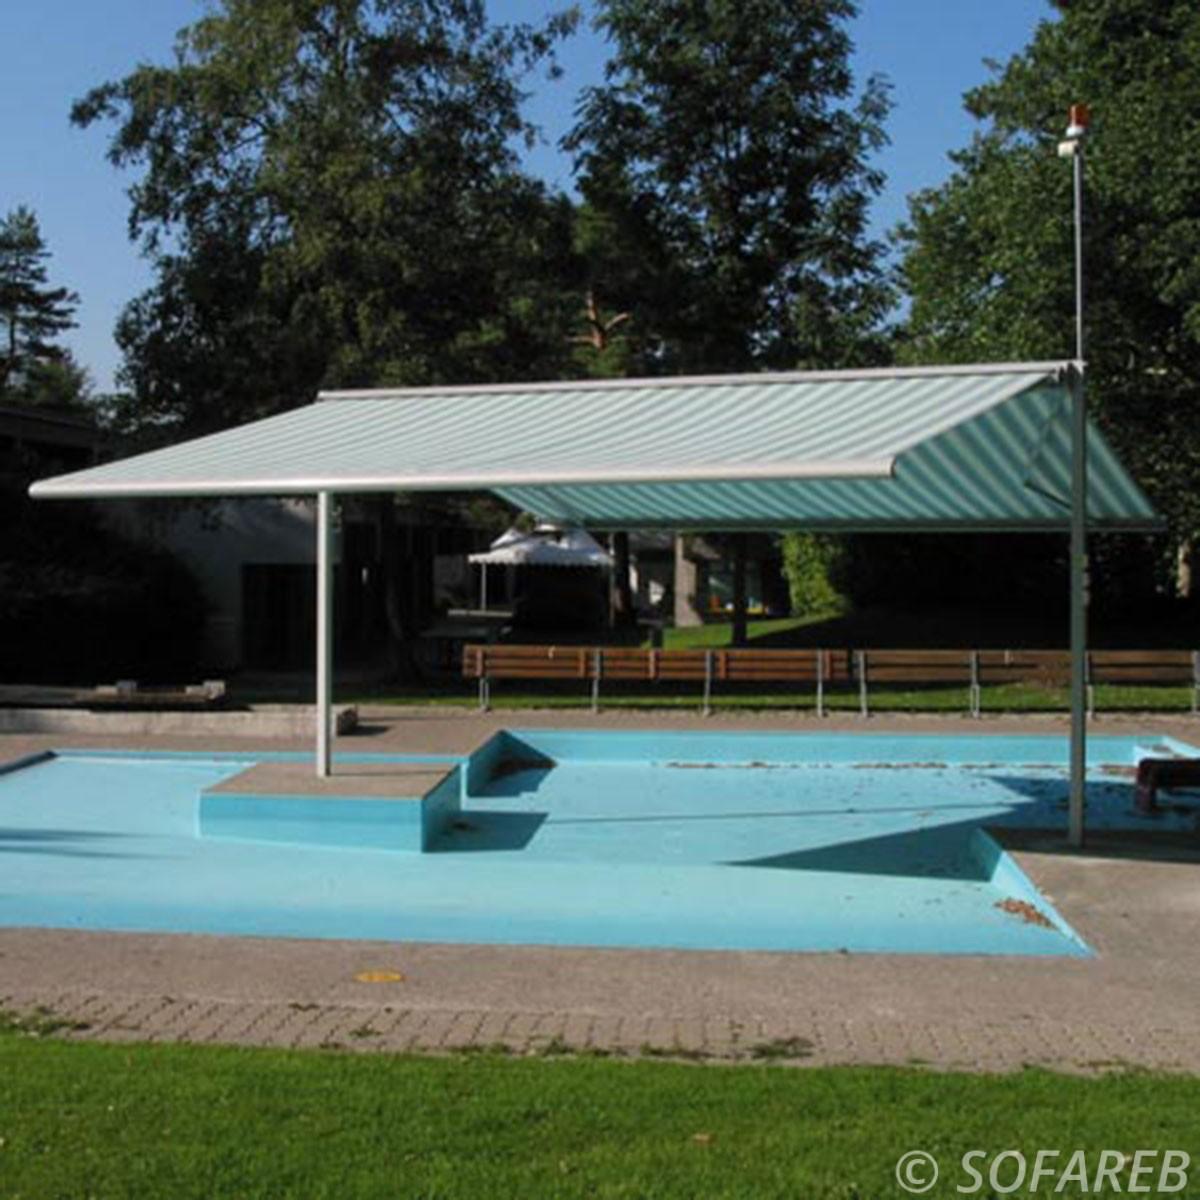 Velum blanc et bleue ombrage piscine fabrication vendee store